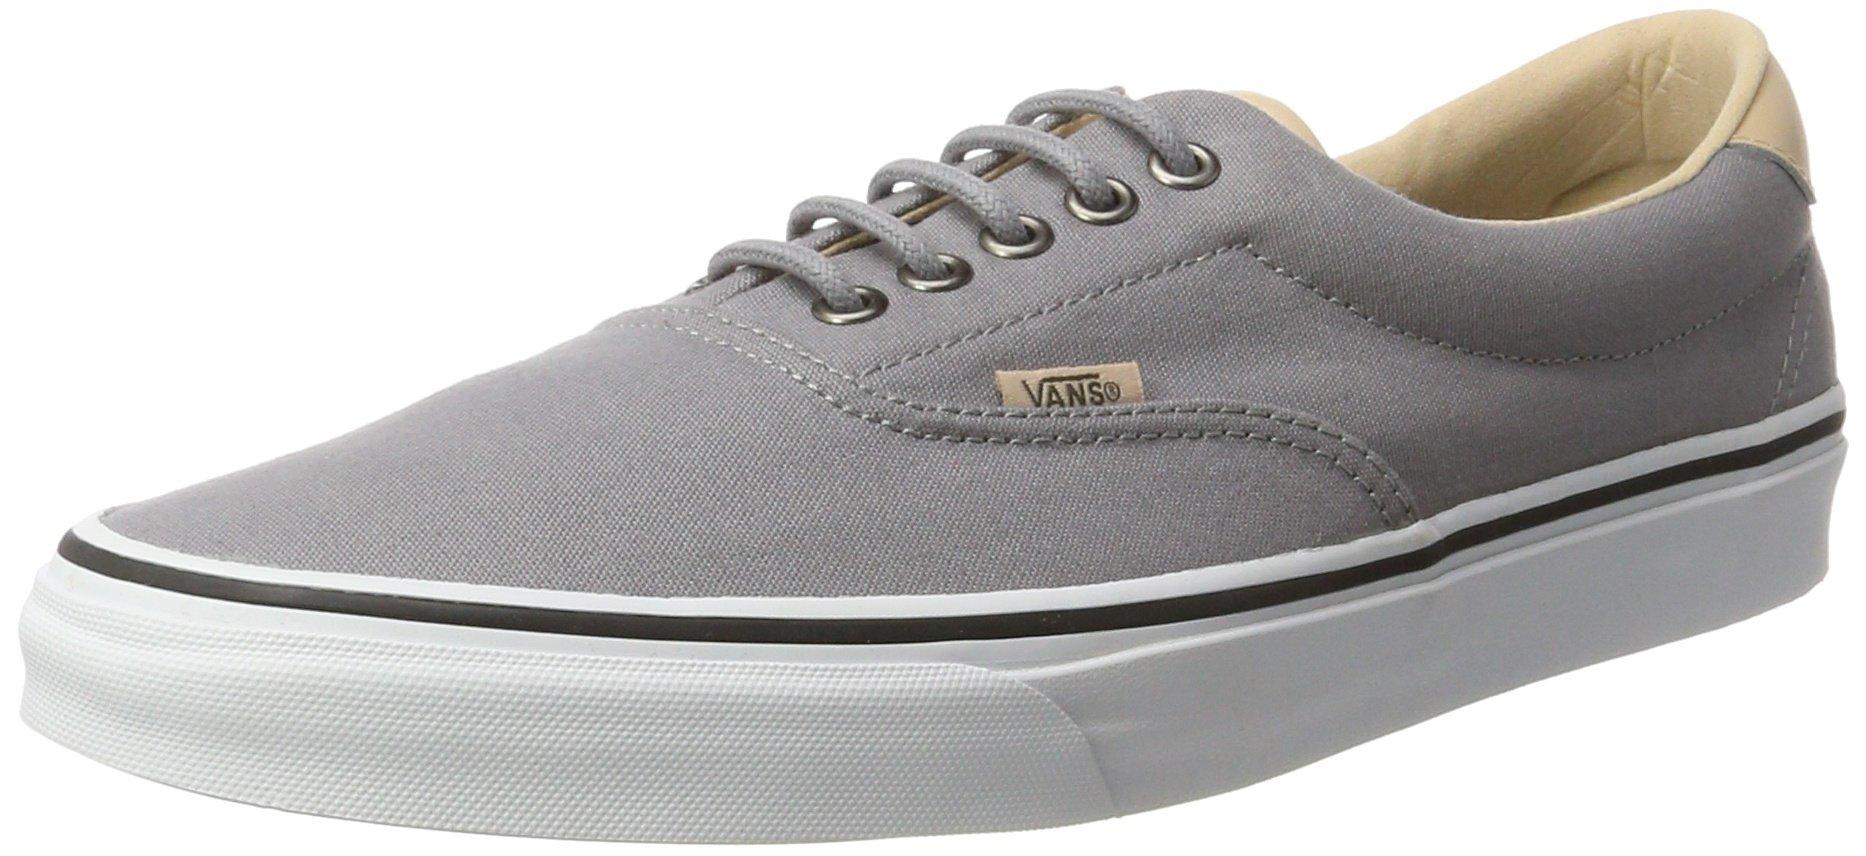 c90c0dce649 Galleon - Vans Men s Era 59 (Veggie Tan) Skateboarding Shoes (9.5 B(M) US  Women   8 D(M) US Men